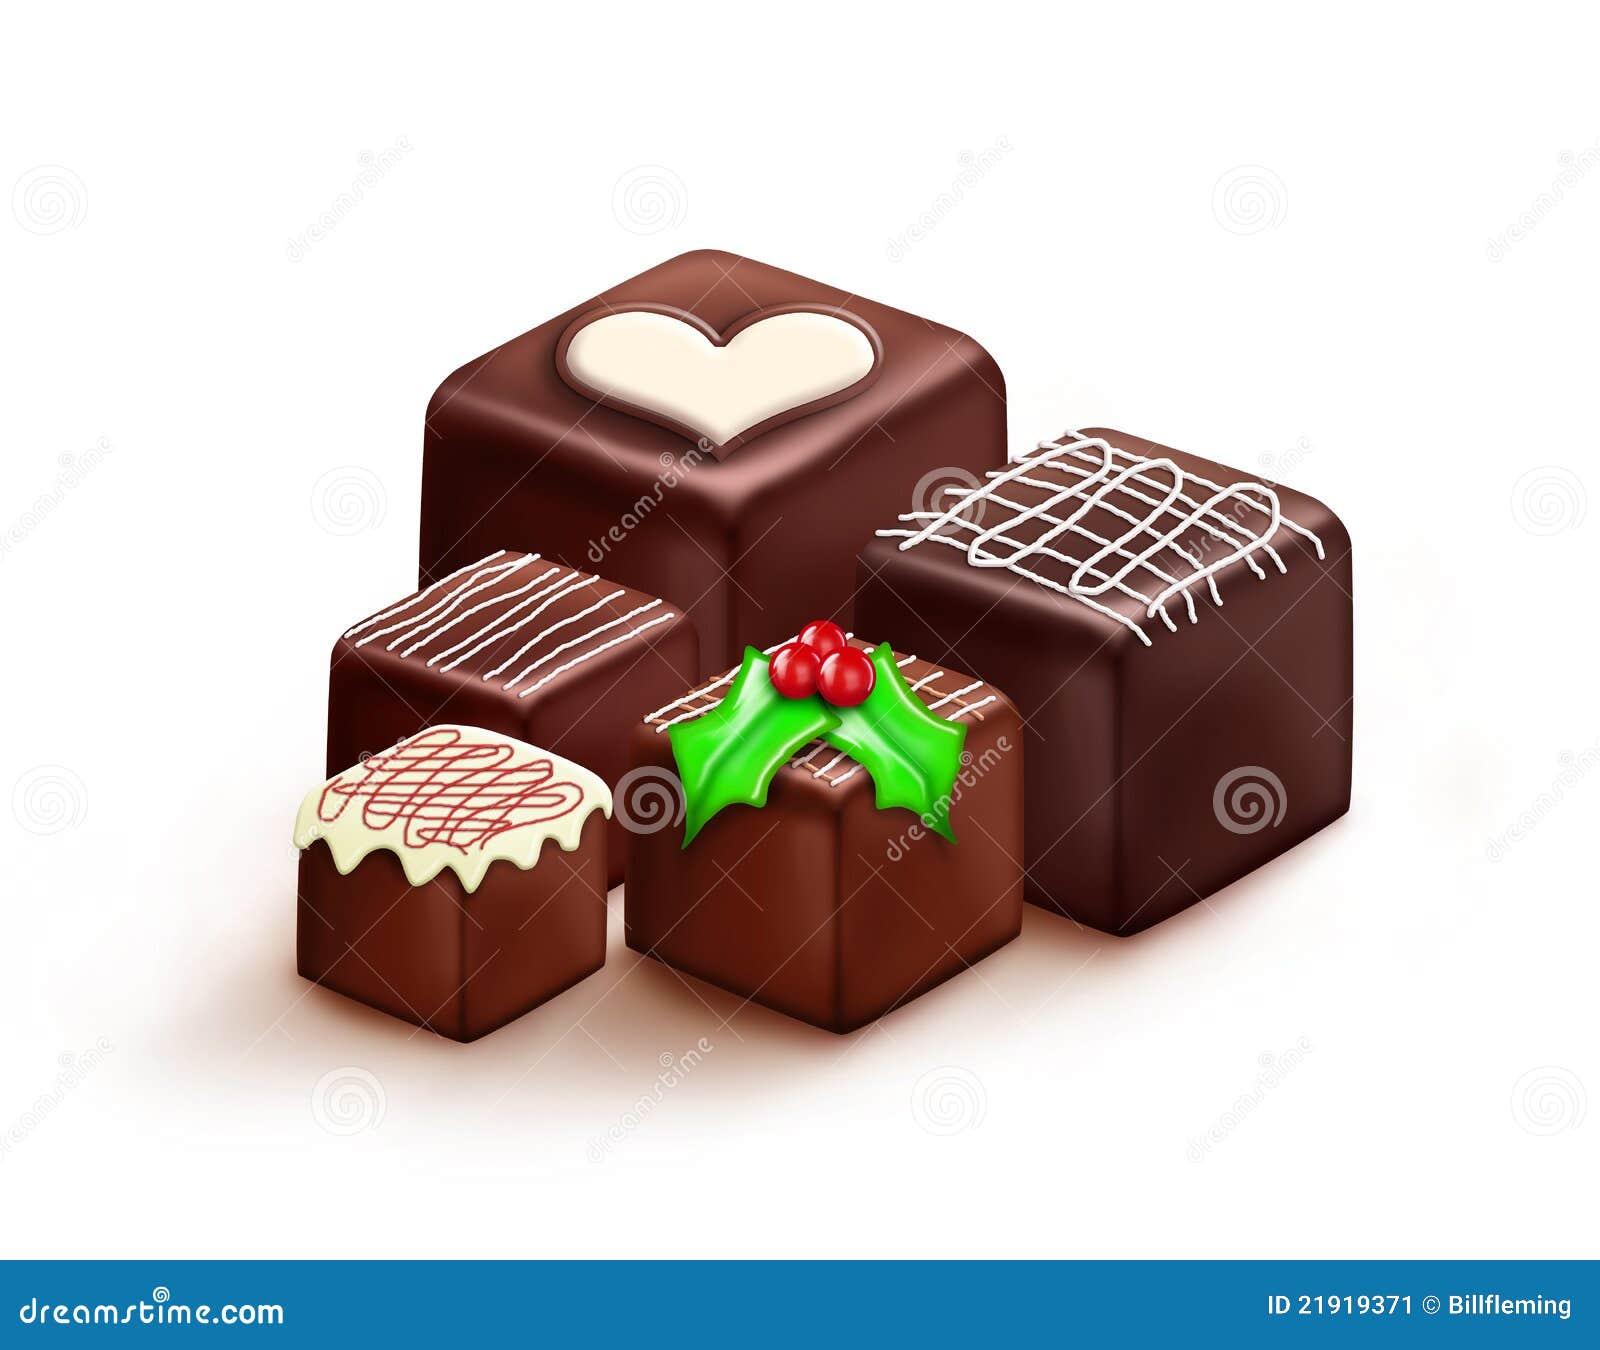 Cute Christmas Chocolates Royalty Free Stock Photography - Image ...